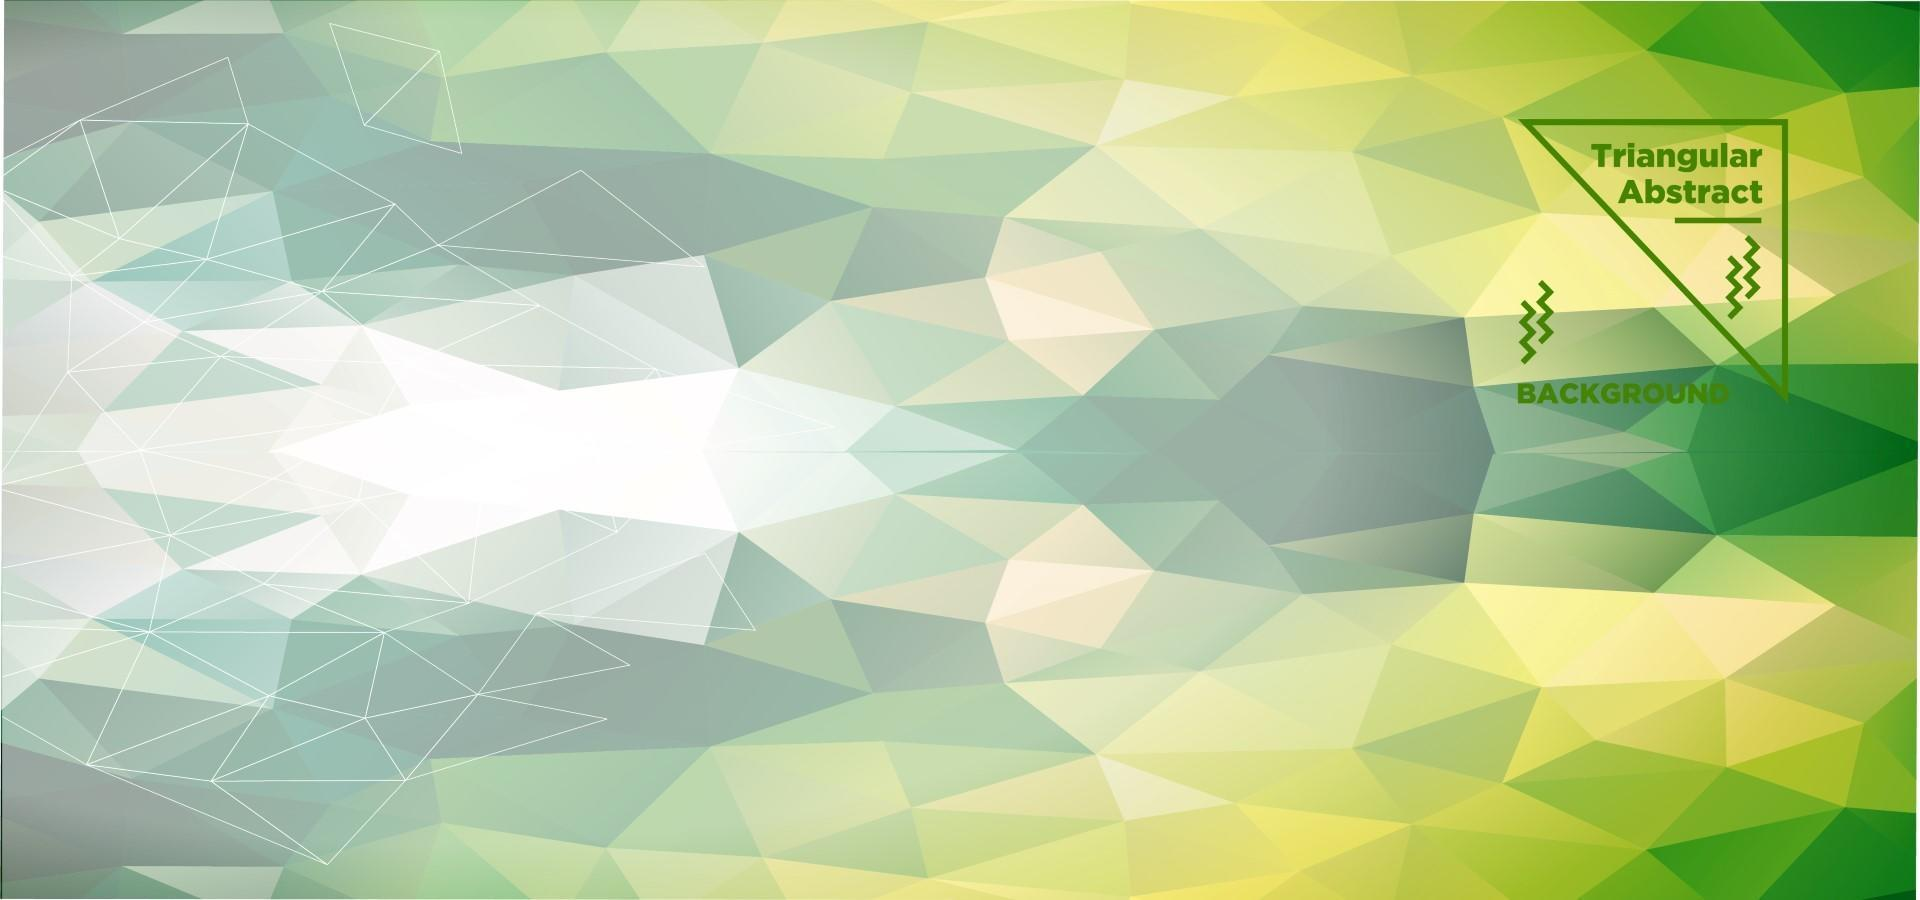 grüner dreieckiger polygonaler Hintergrund vektor